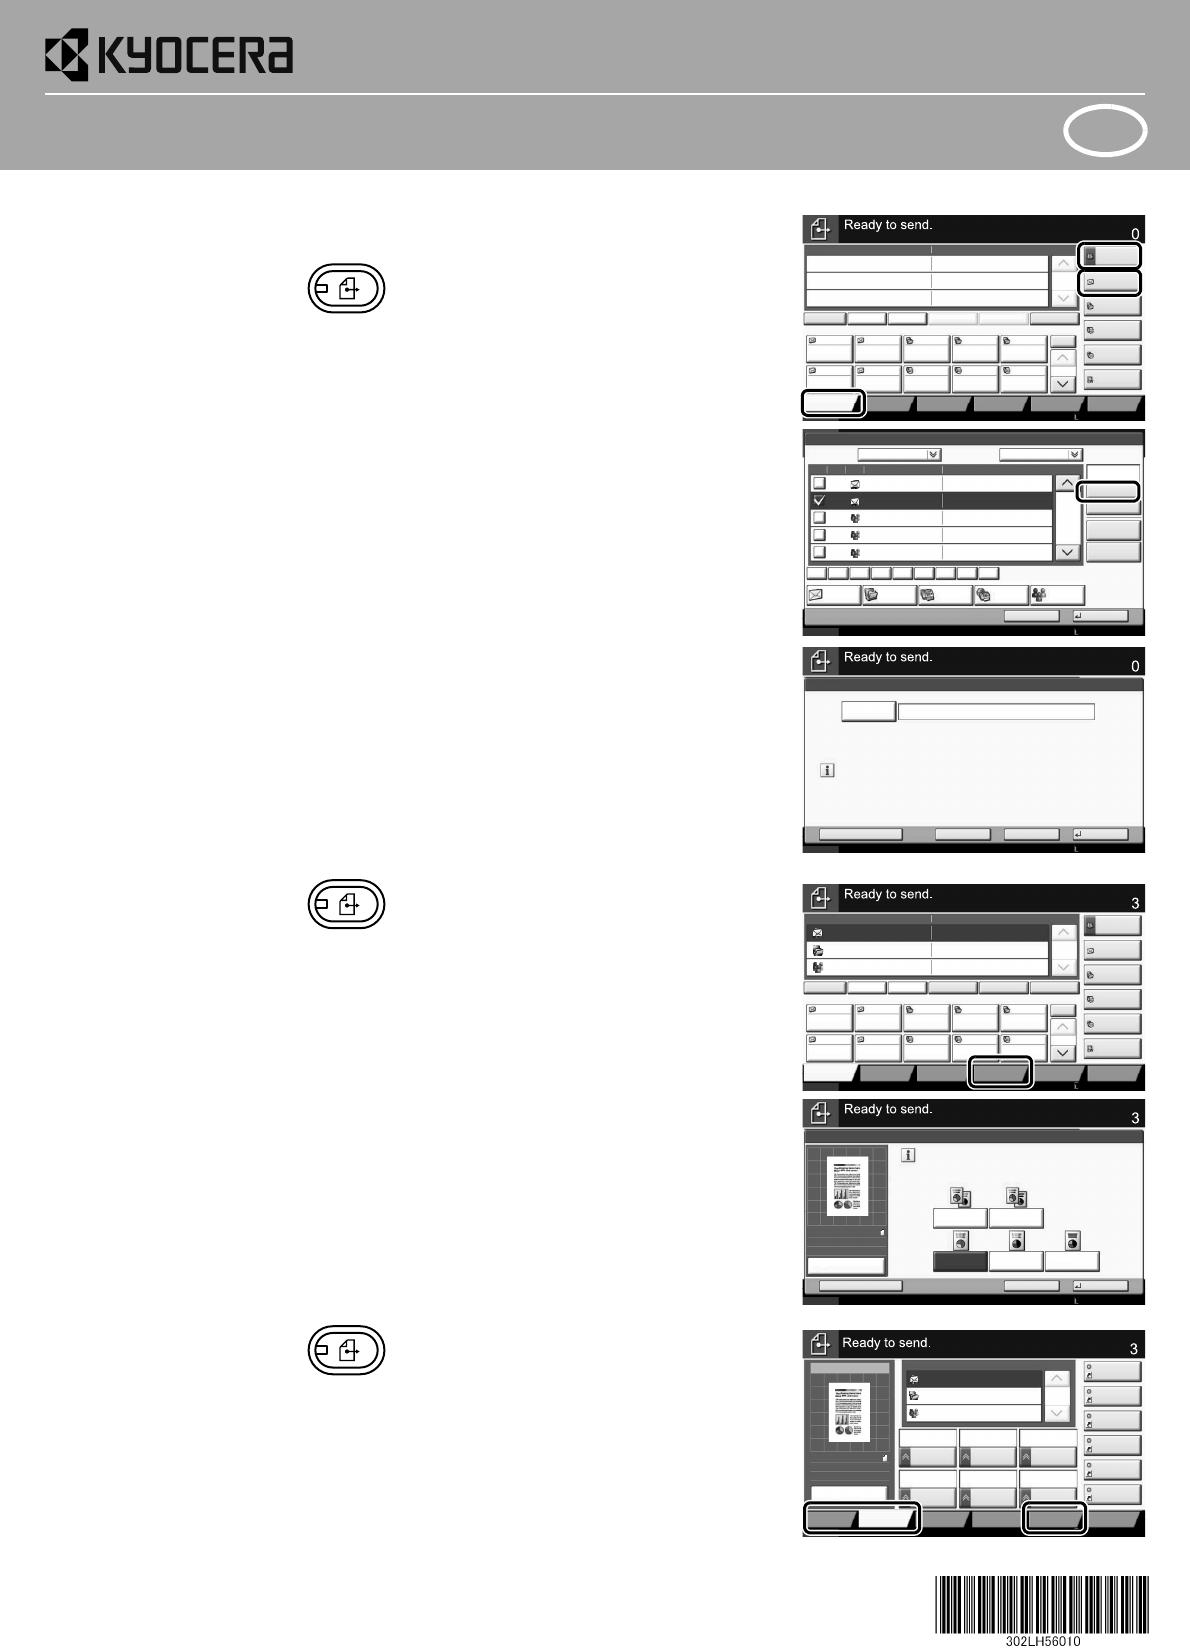 Kyocera TASKalfa 5500i manual